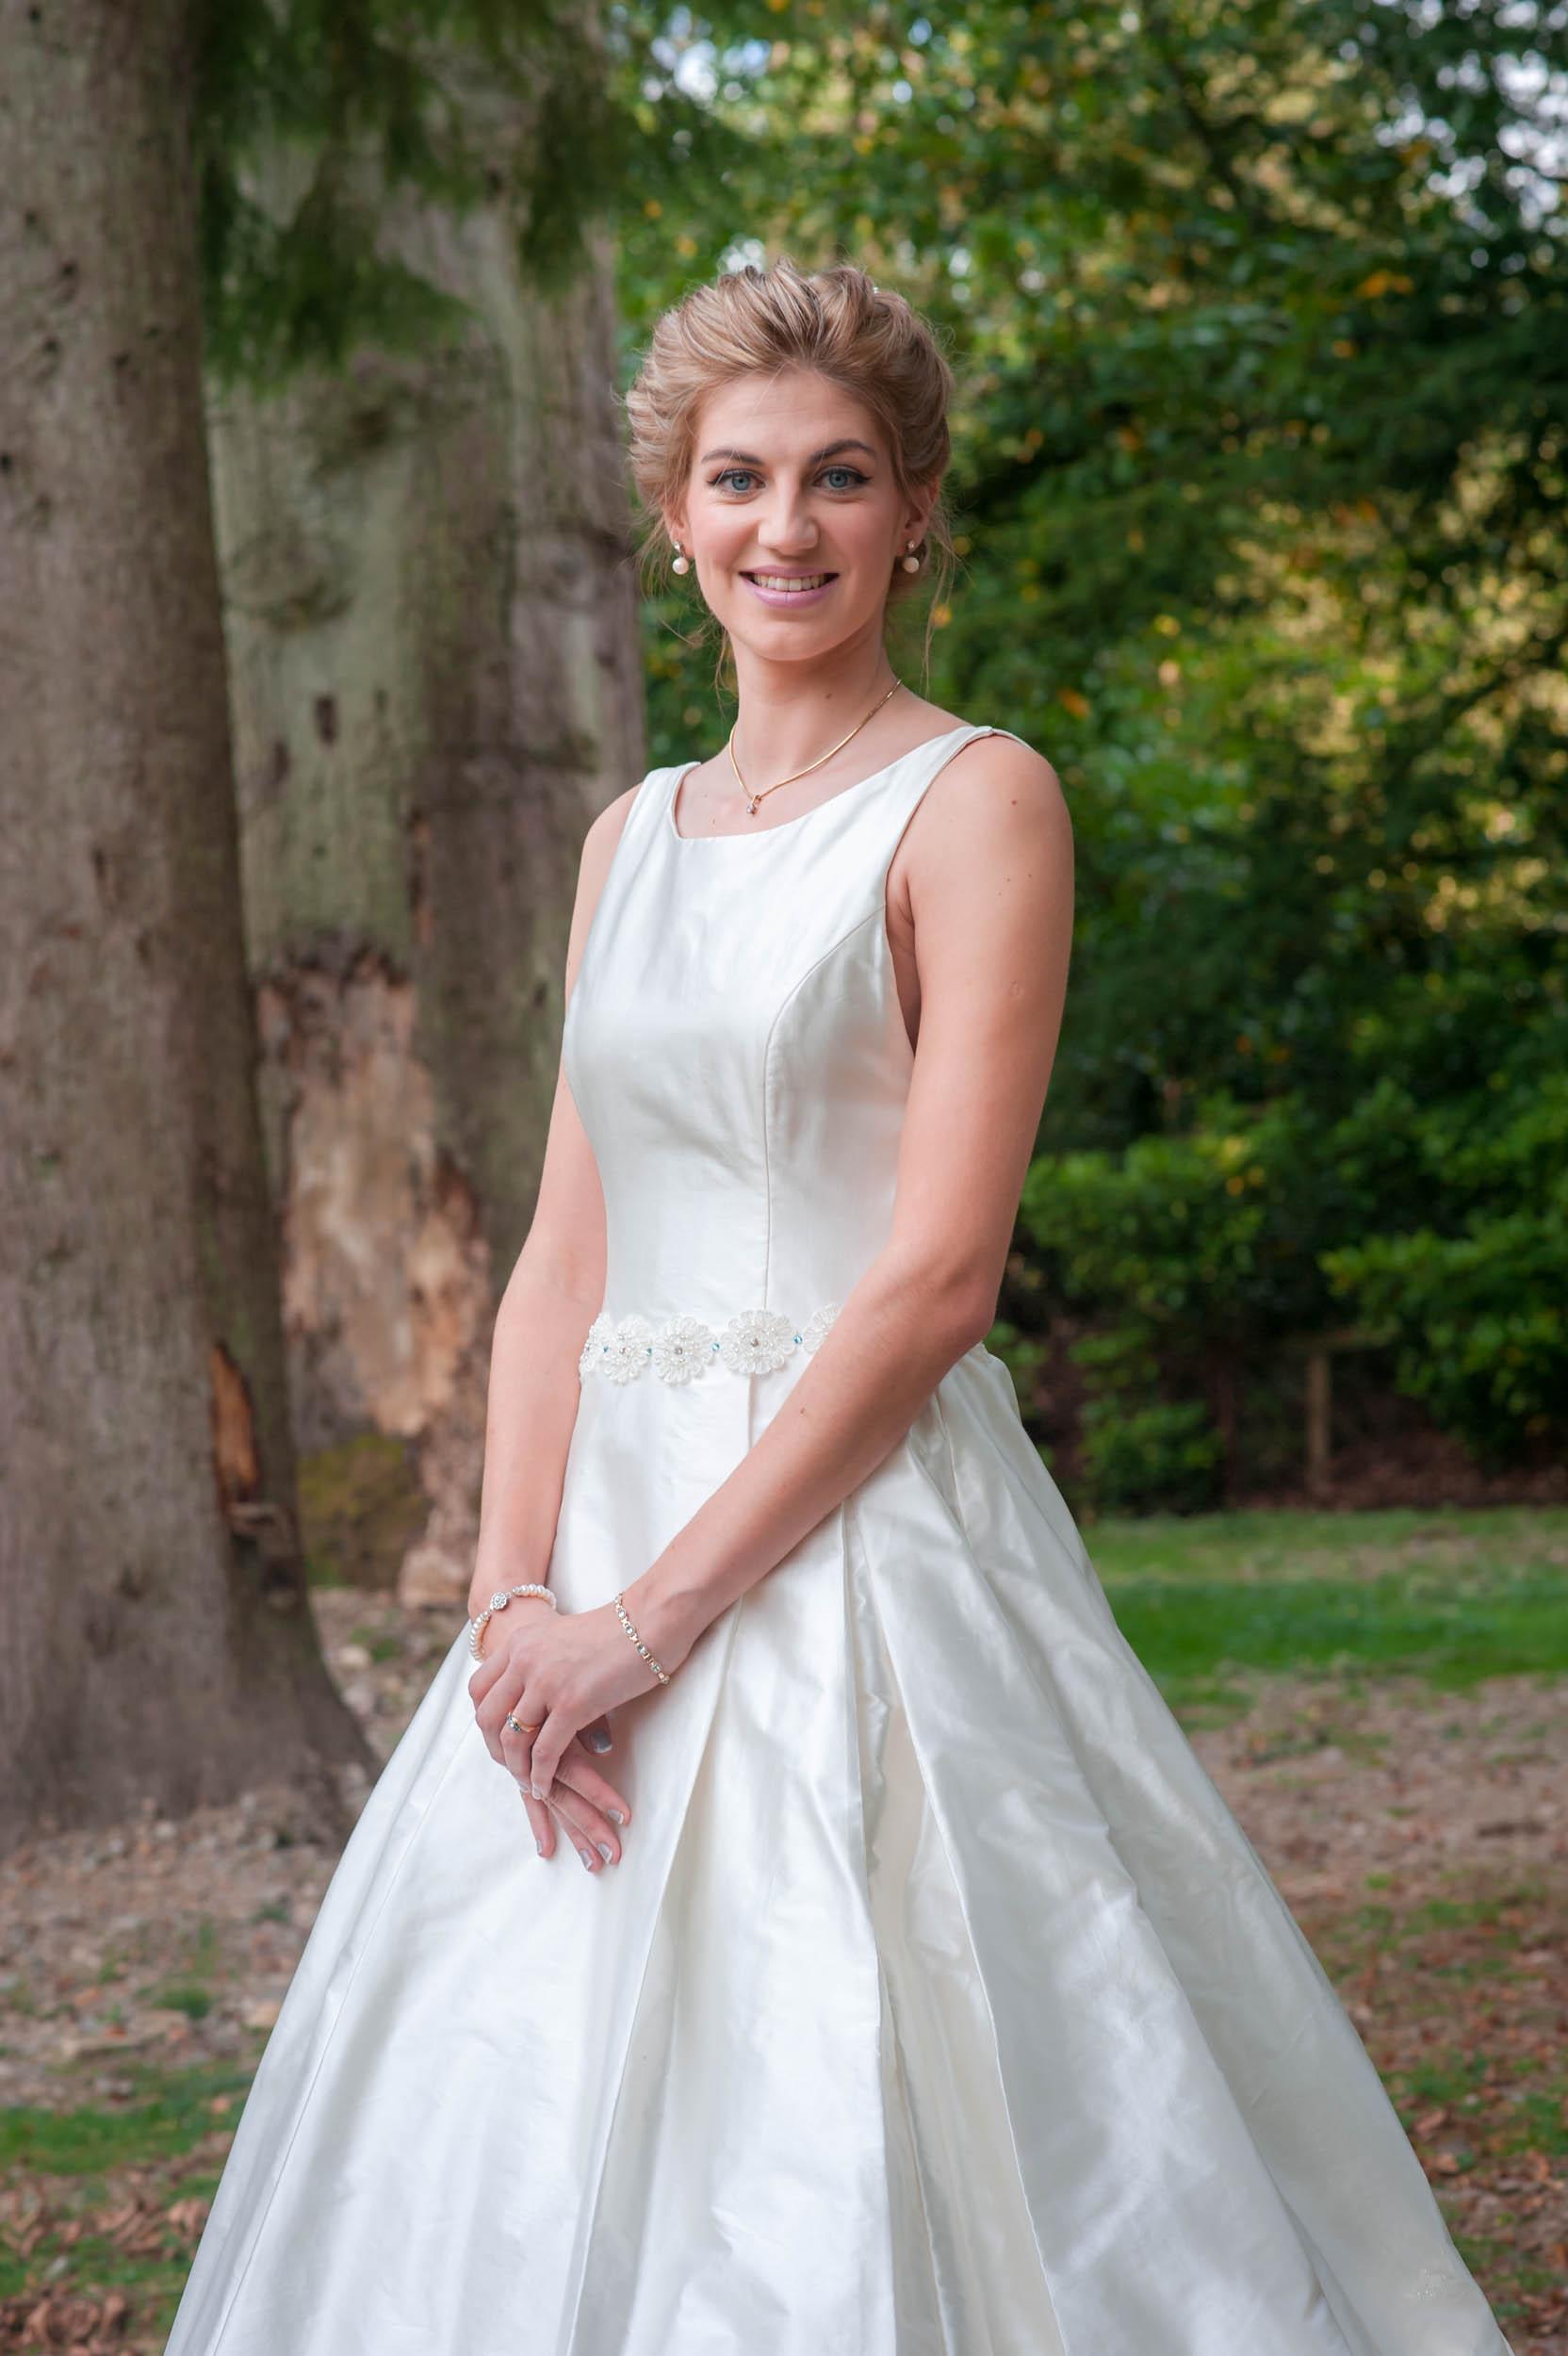 Bride-0345.jpg